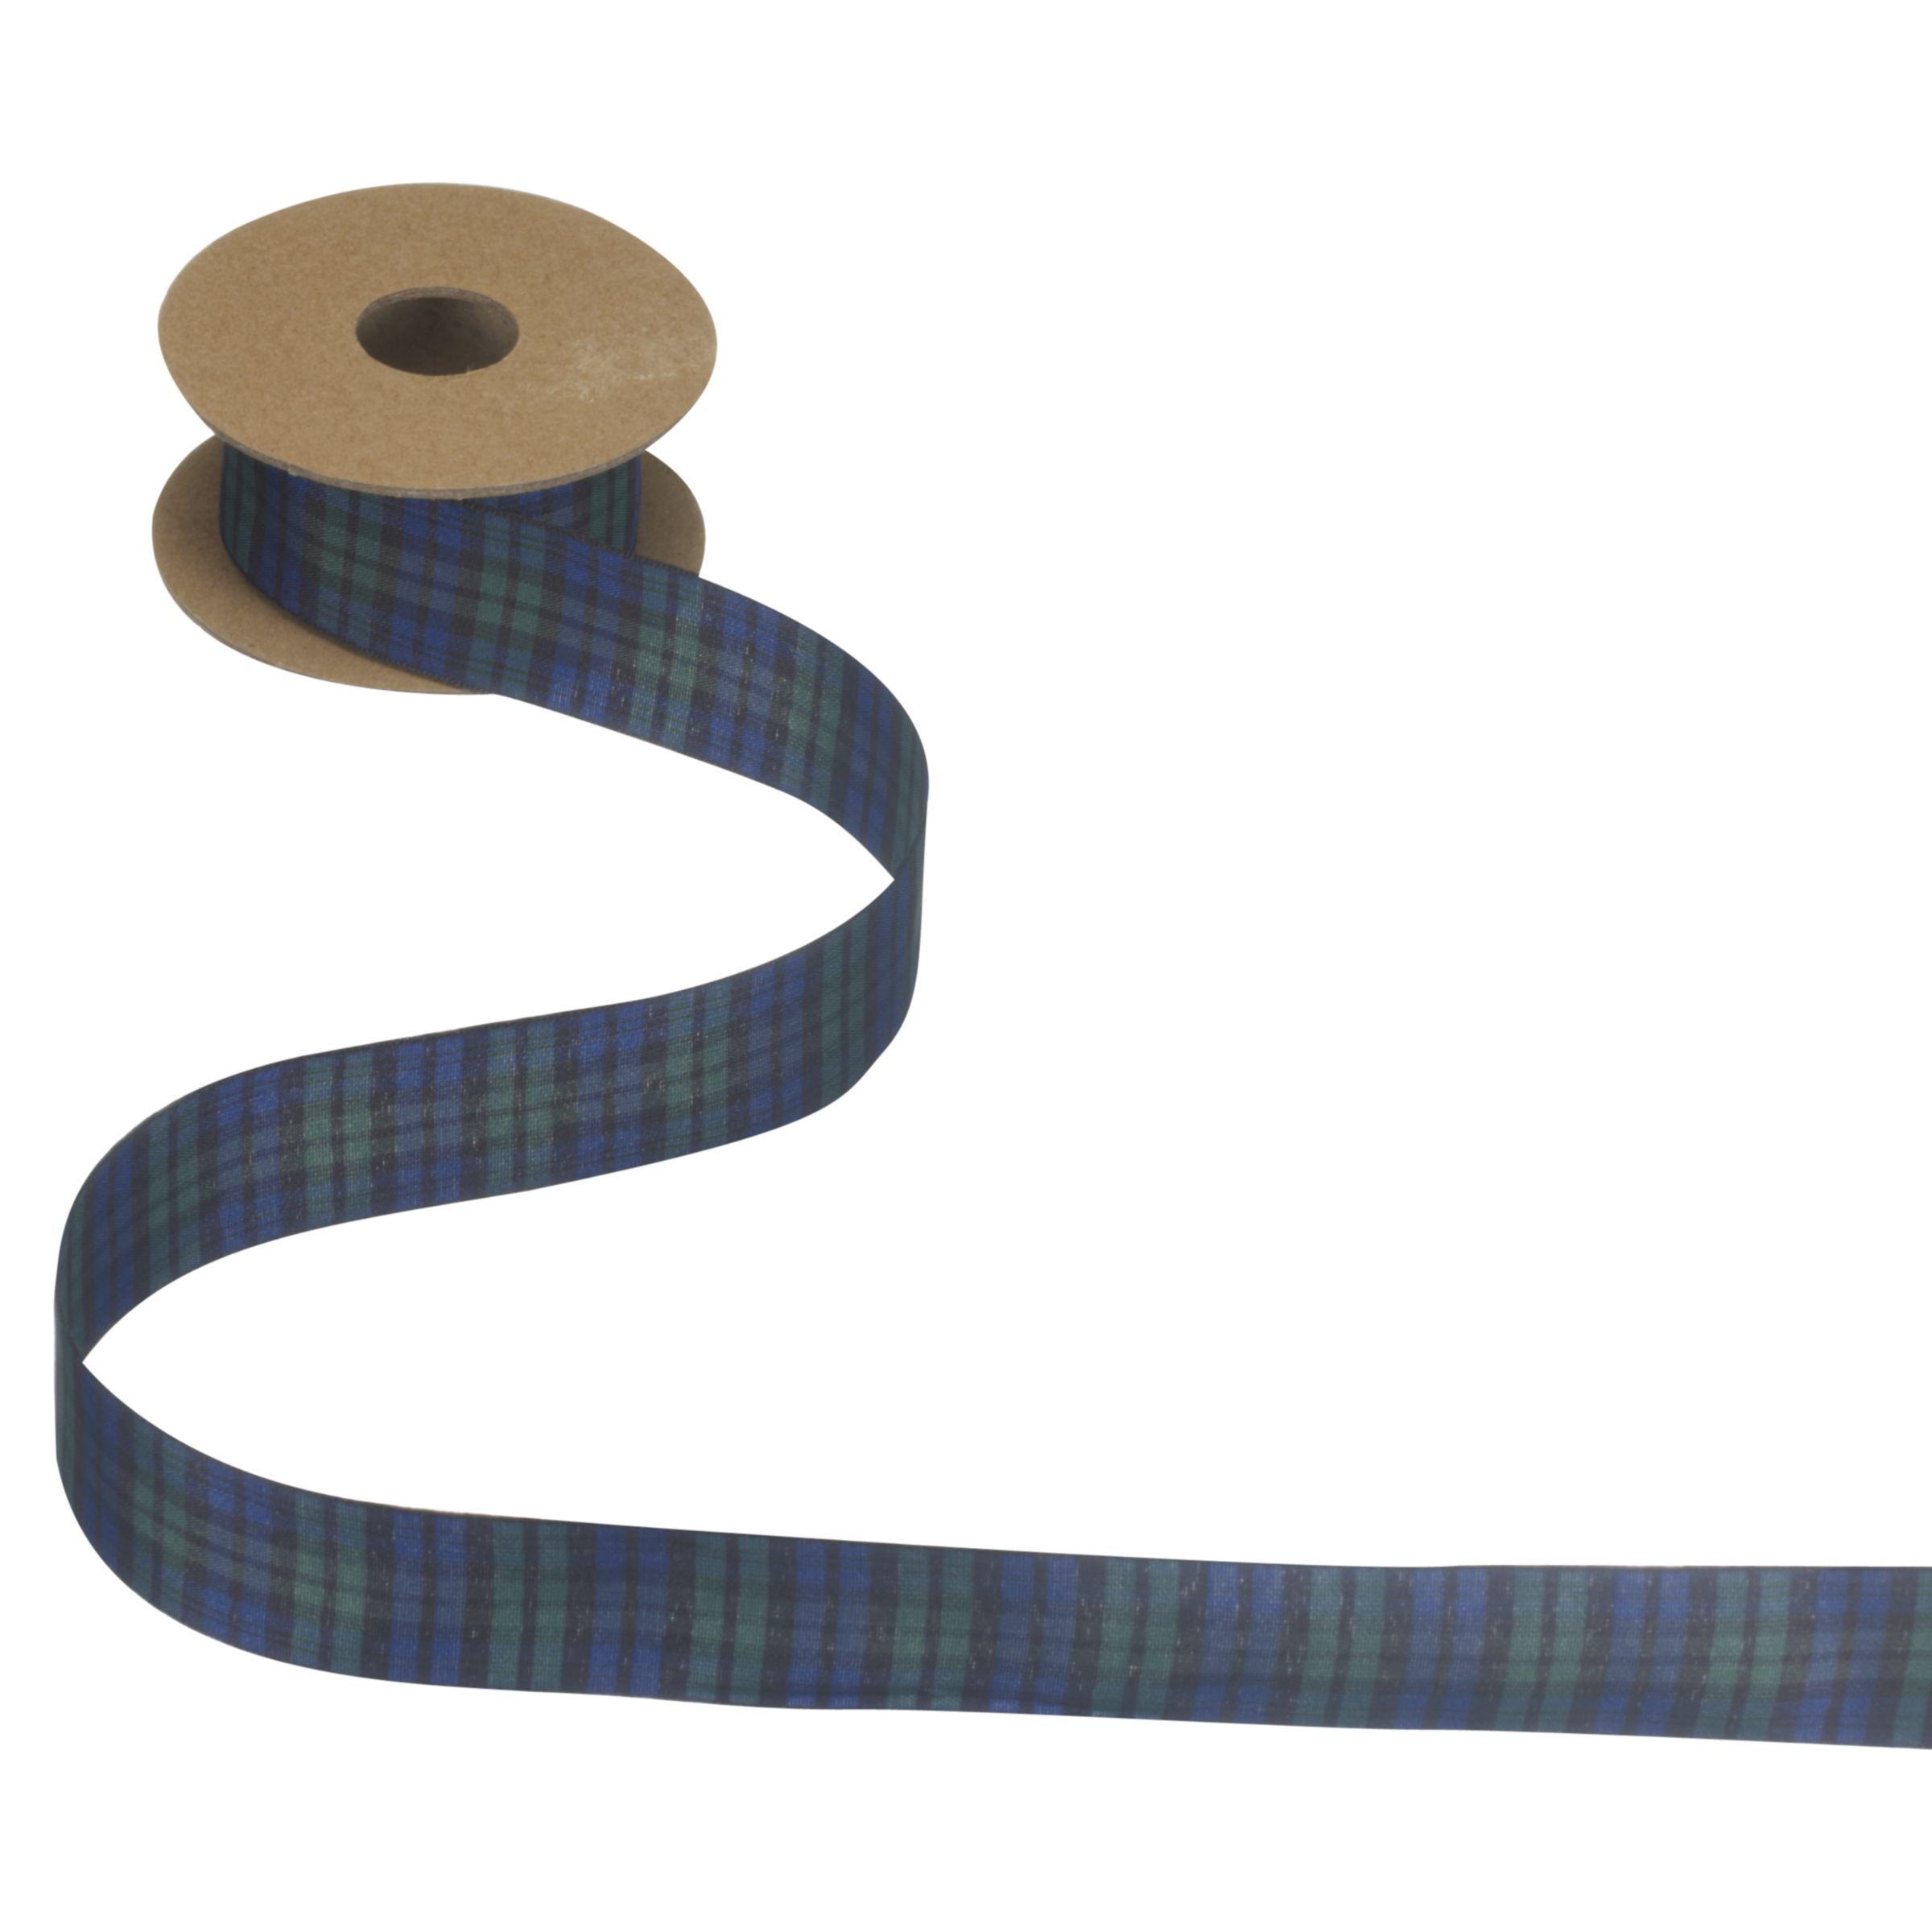 John Lewis & Partners Tartan Ribbon, 5m  - Black Watch - Size: 25mm